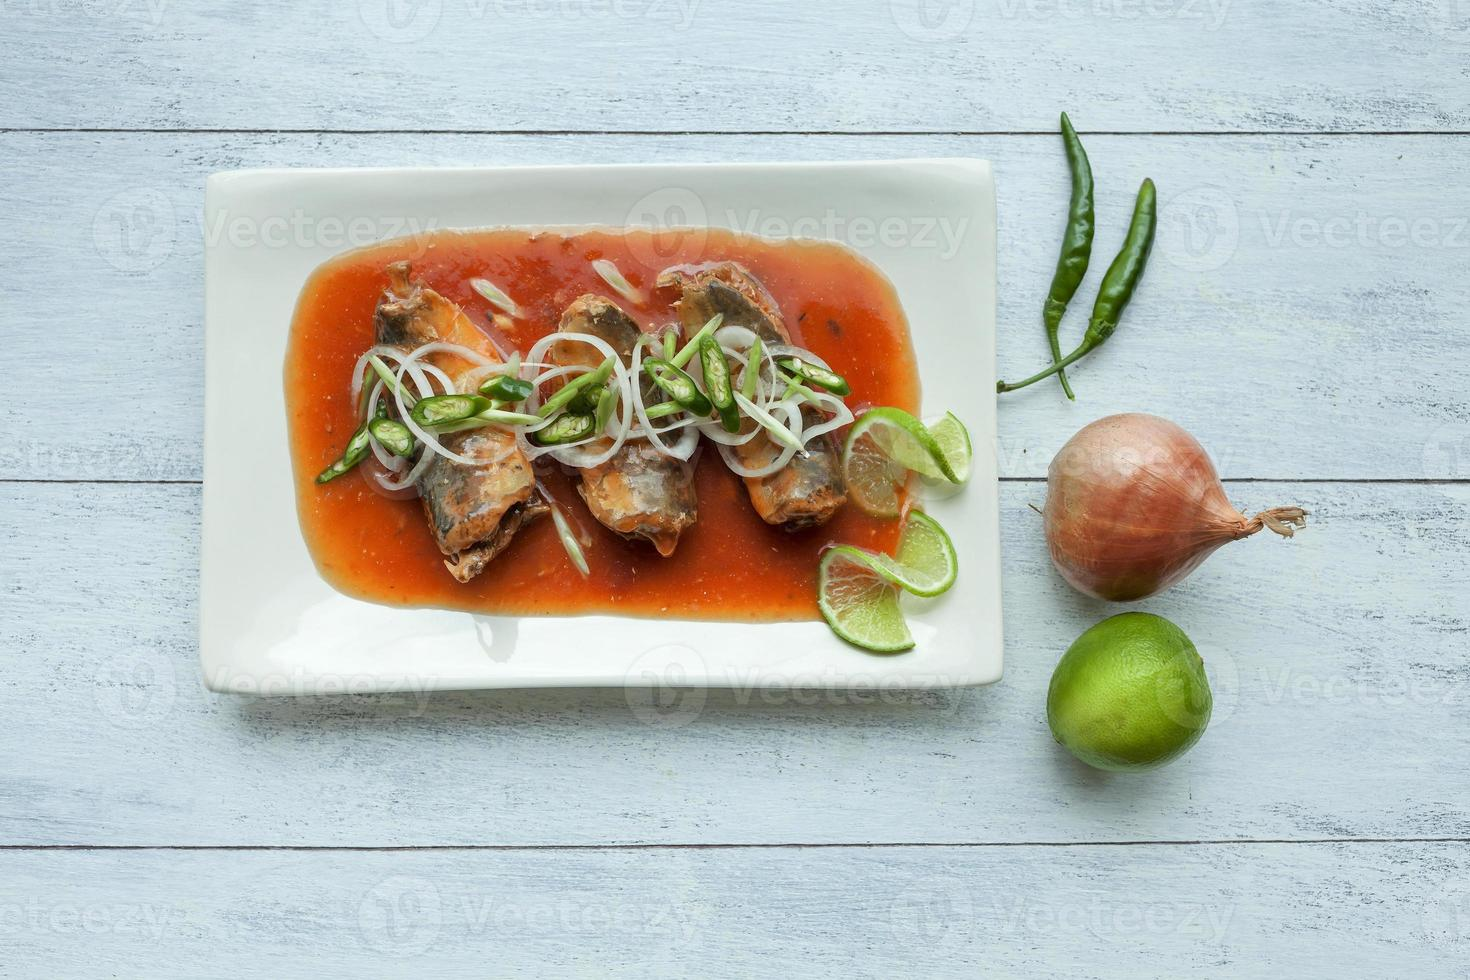 caballa enlatada al estilo tailandés en salsa de tomate foto